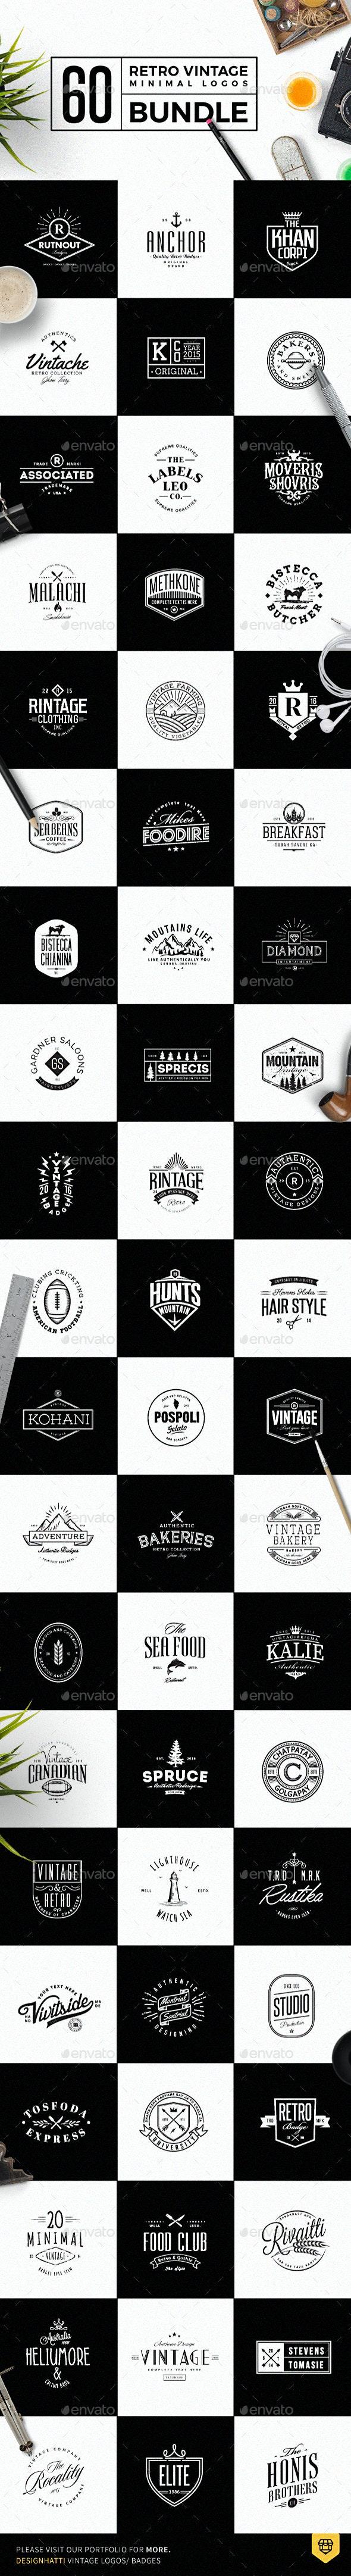 60 Vintage Minimal Logos Bundle - Badges & Stickers Web Elements